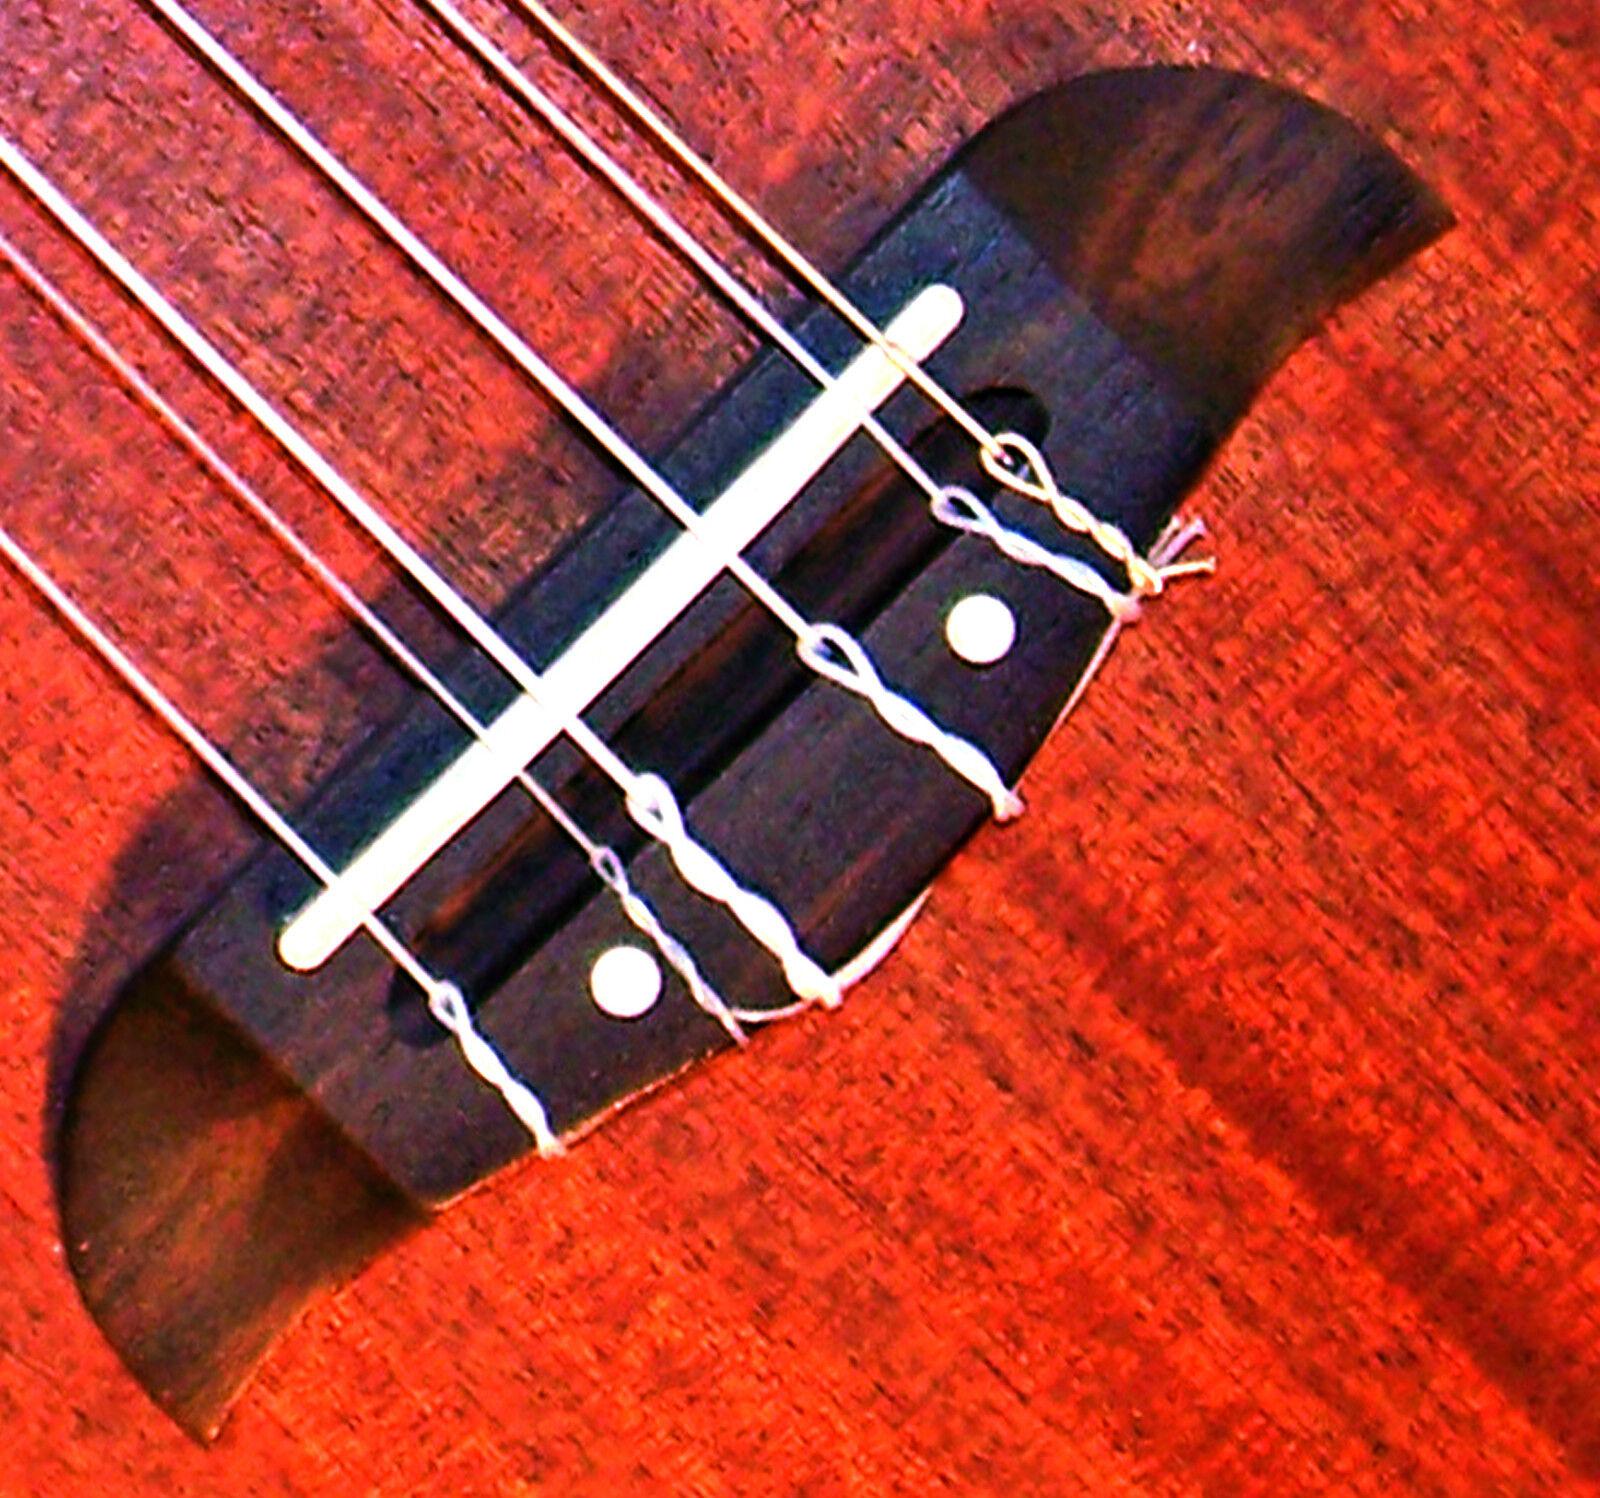 Oscar Schmidt OU26T 6 string Tenor Ukulele, Octave pair C & A, individual G & E